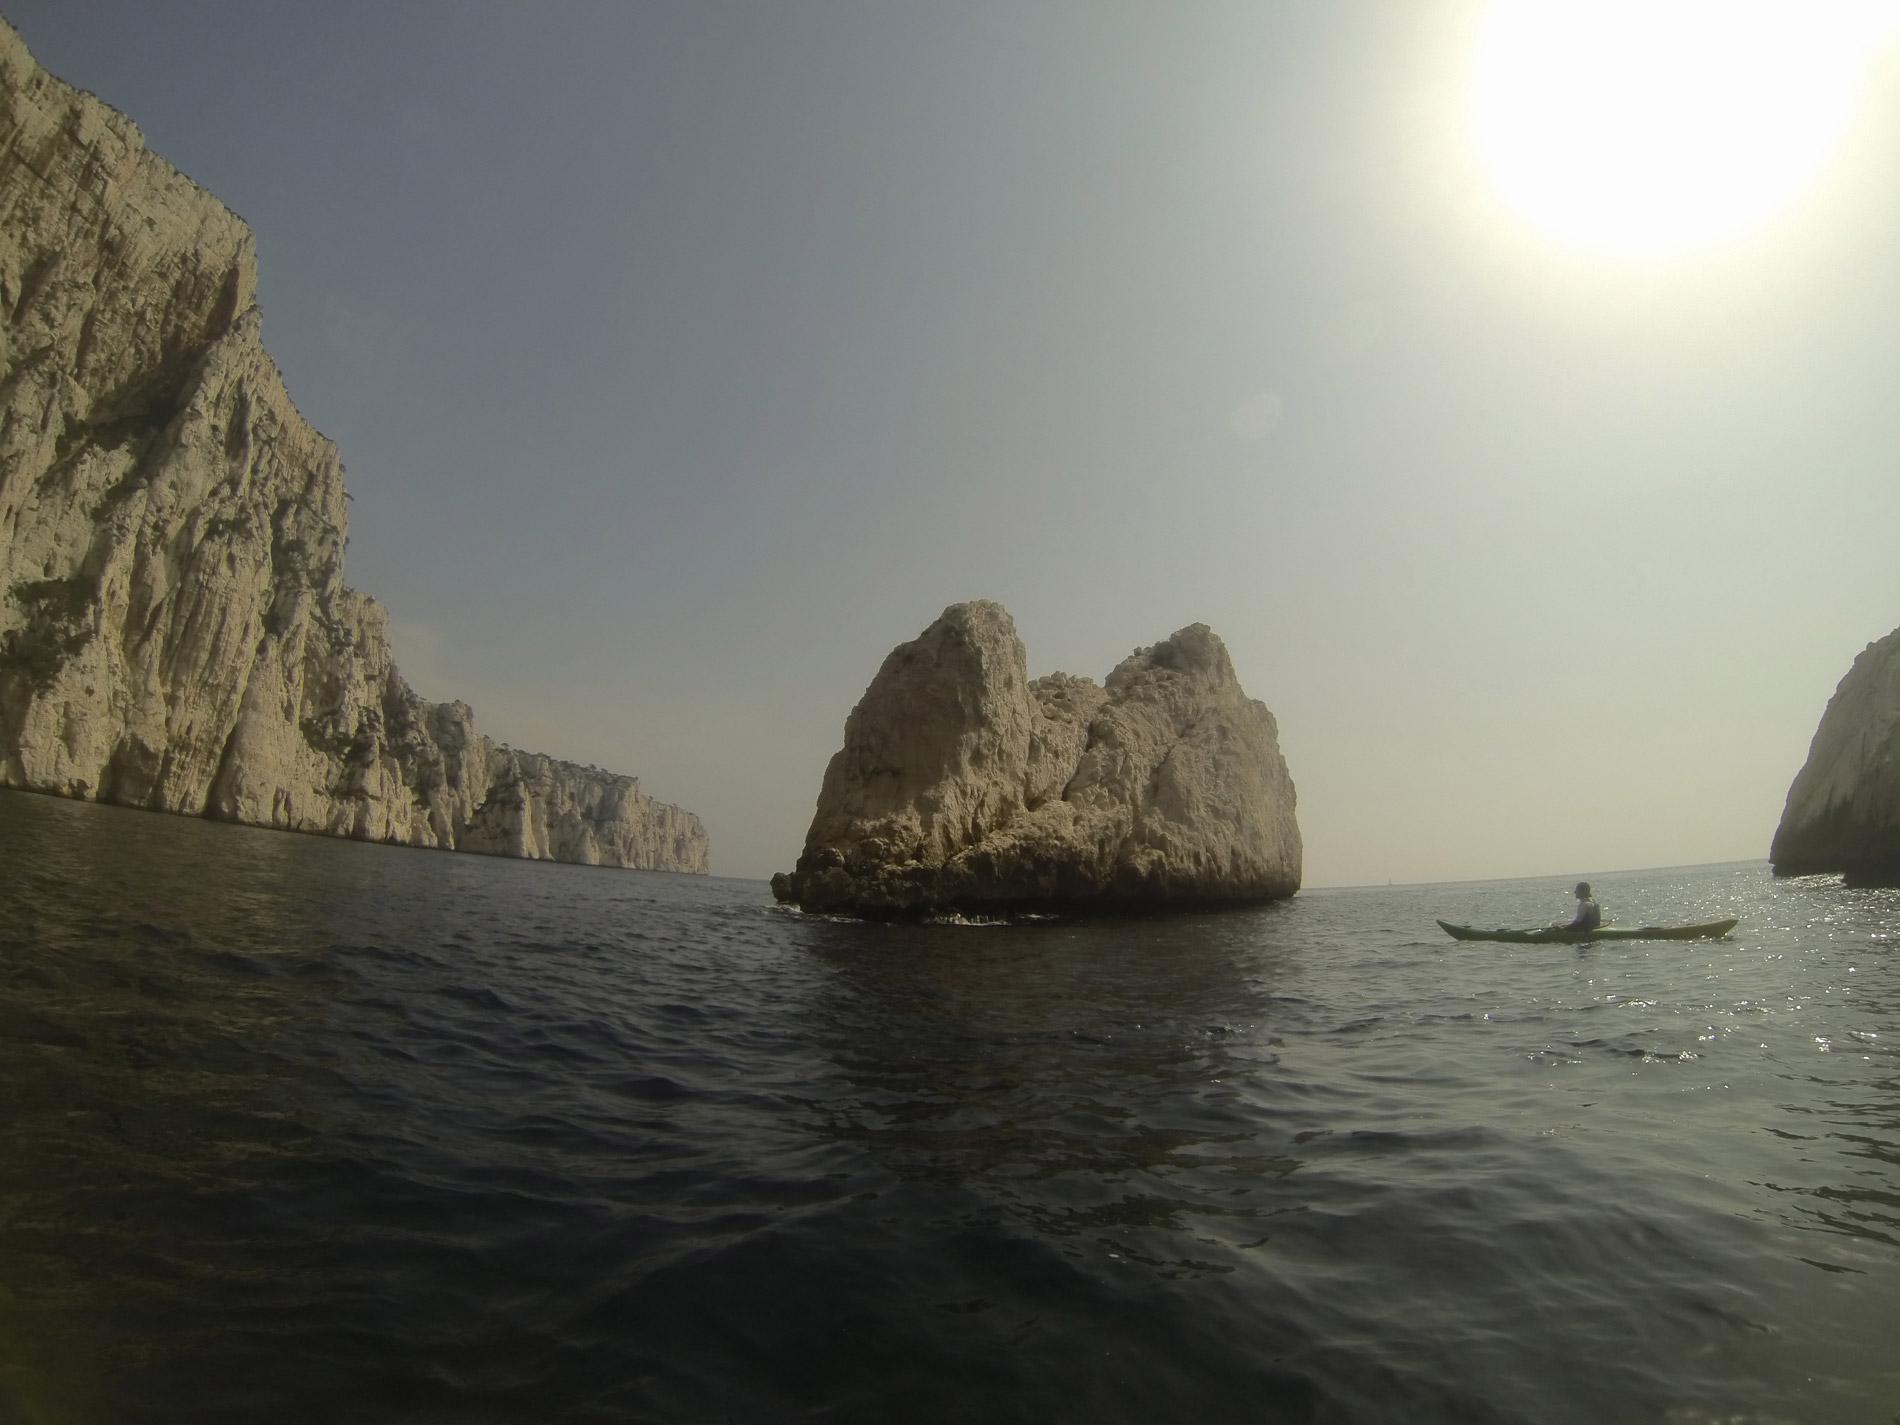 Calanque du Devenson Calanc'O Kayak Paddle Cassis